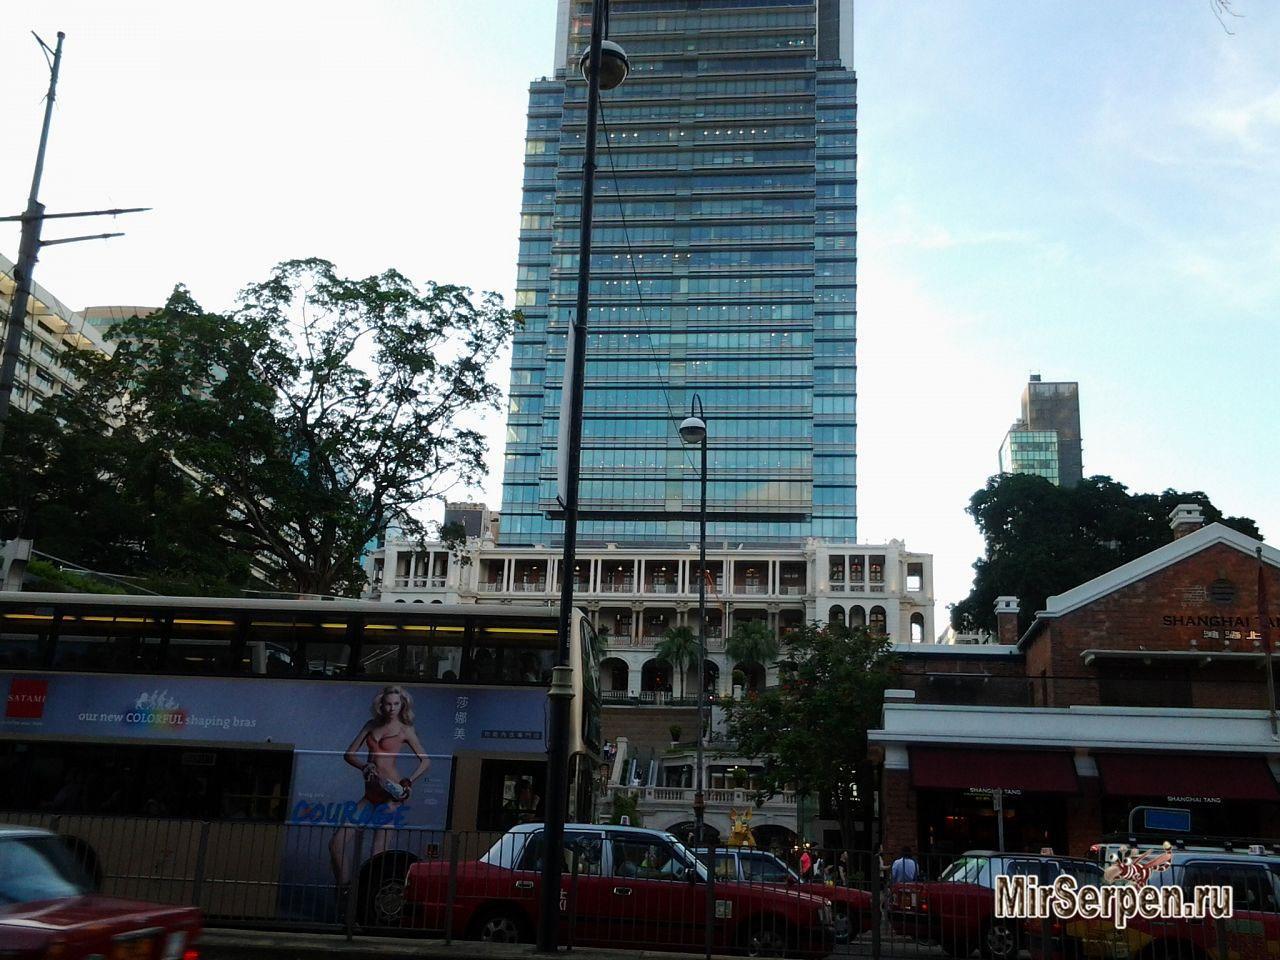 Гонконгский муравейник Chungking mansions: июнь 2014